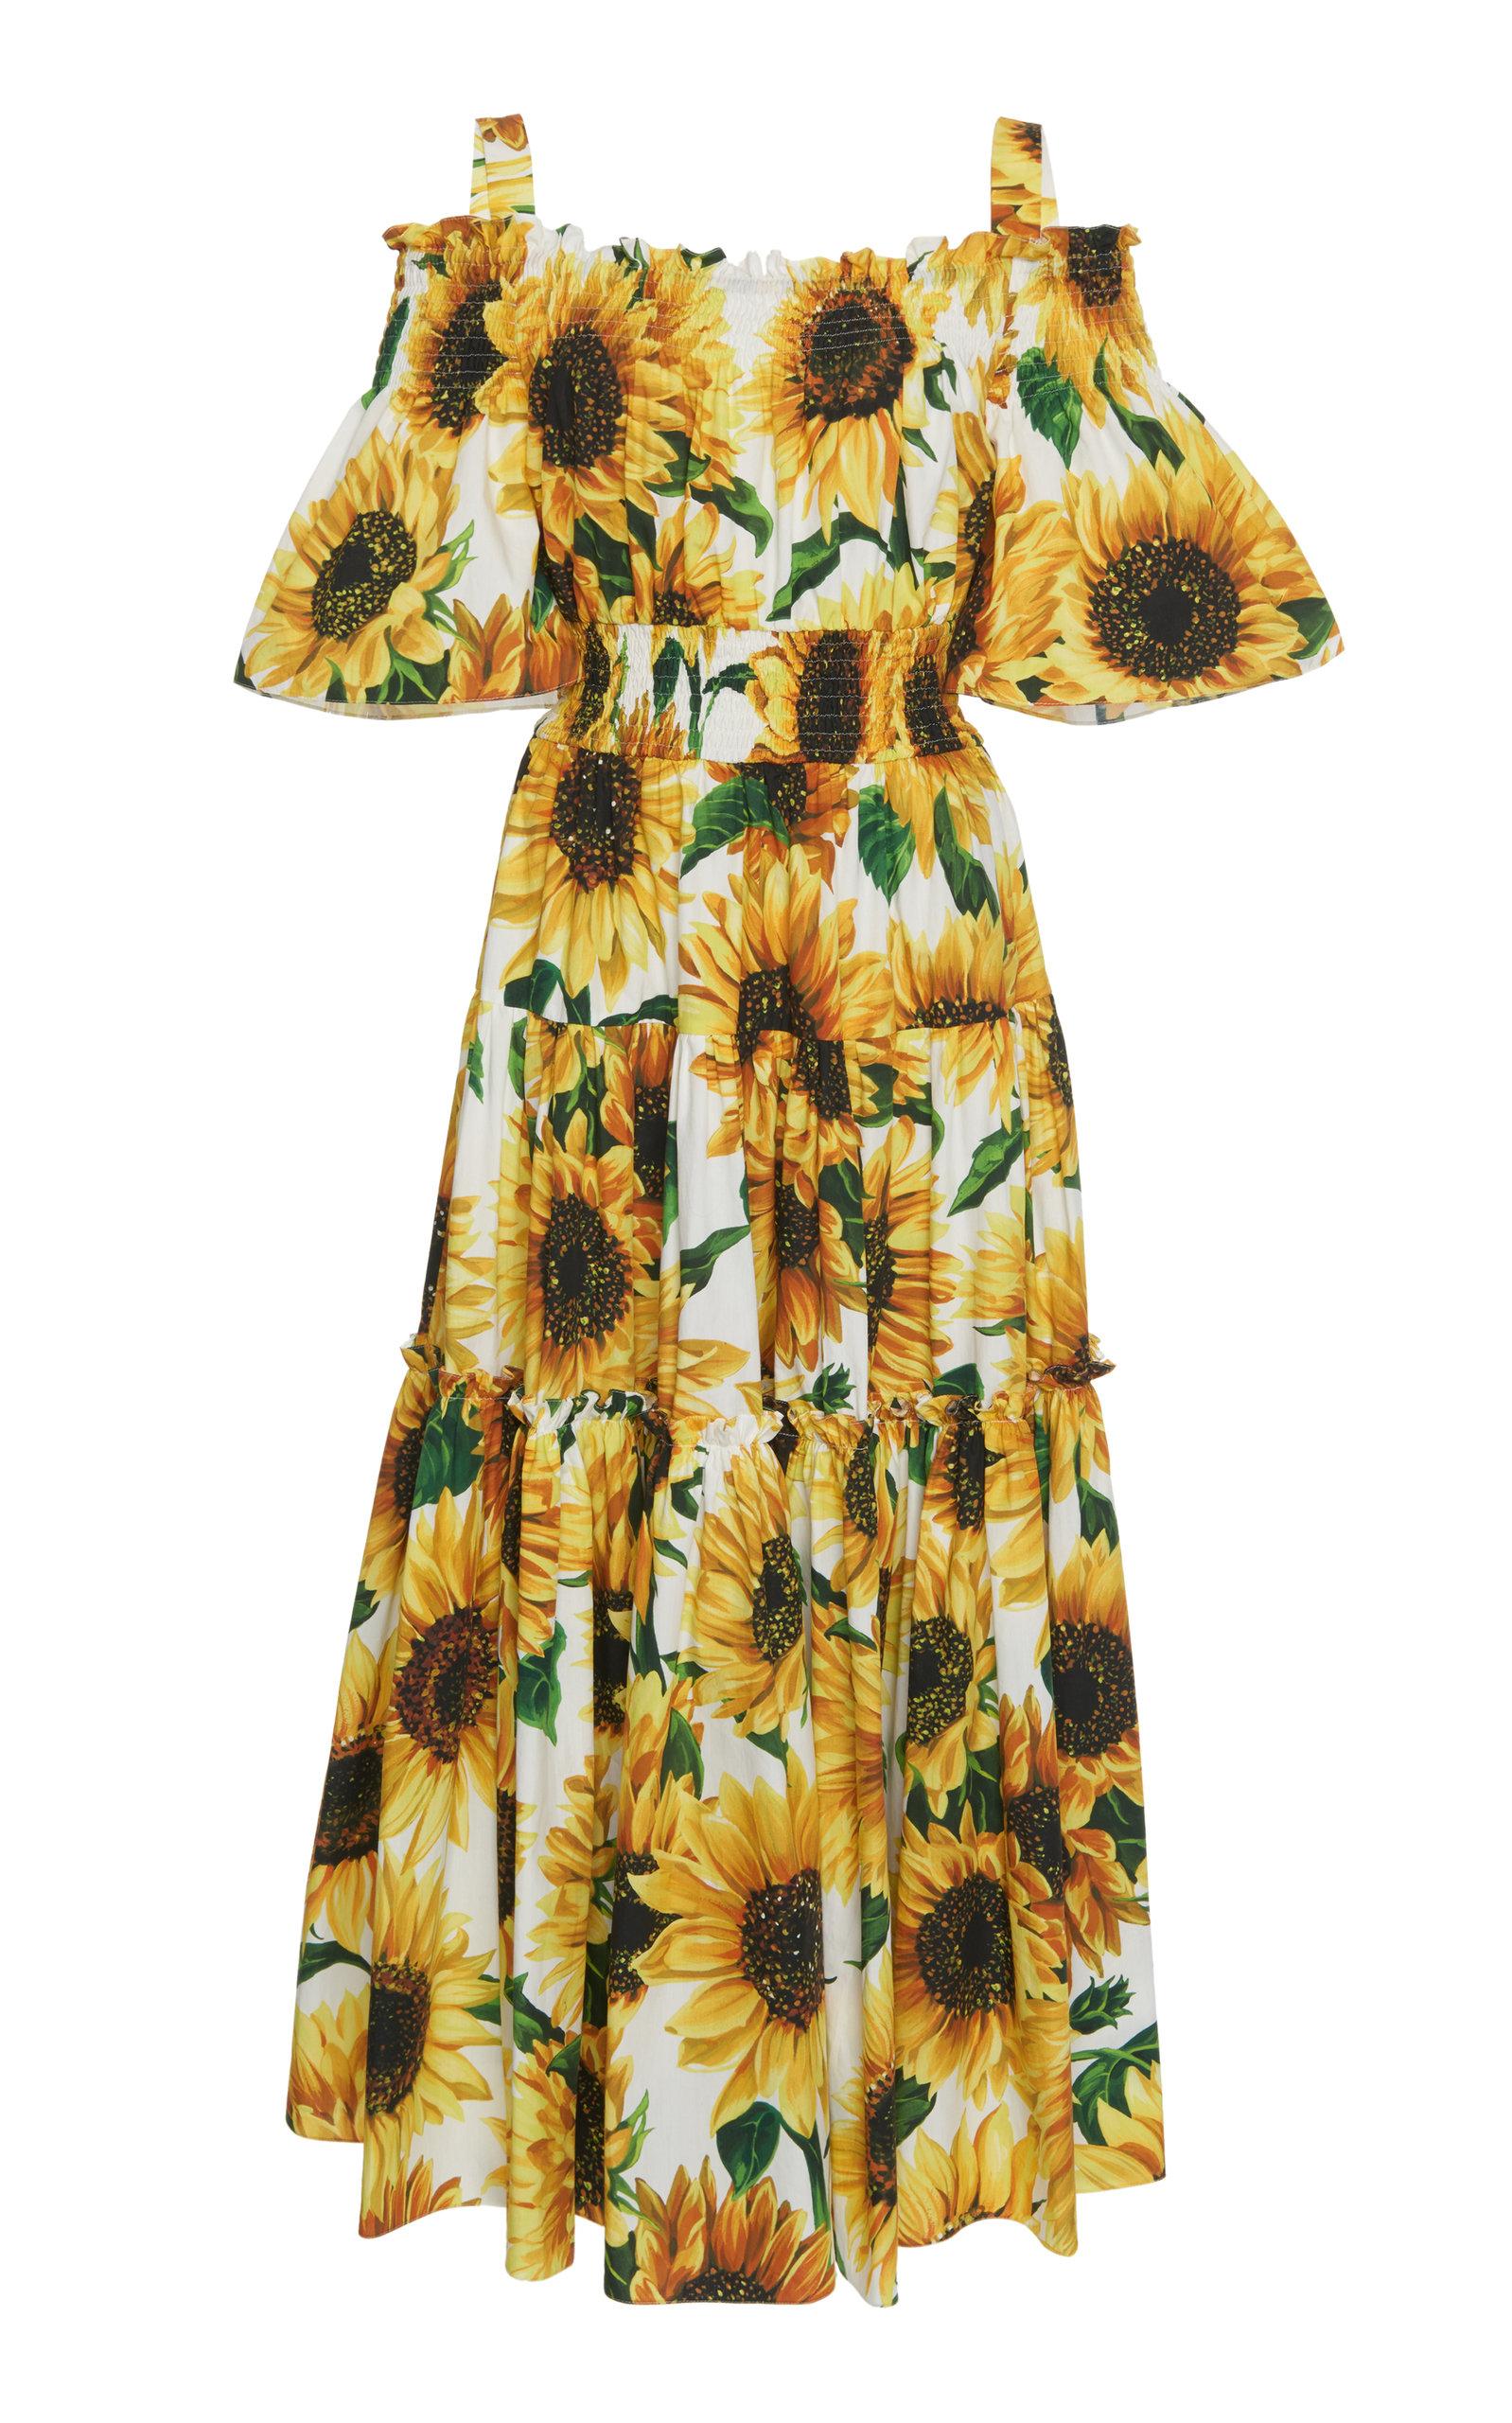 d274b26a Dolce & GabbanaOff-The-Shoulder Smocked Floral-Print Cotton Maxi Dress